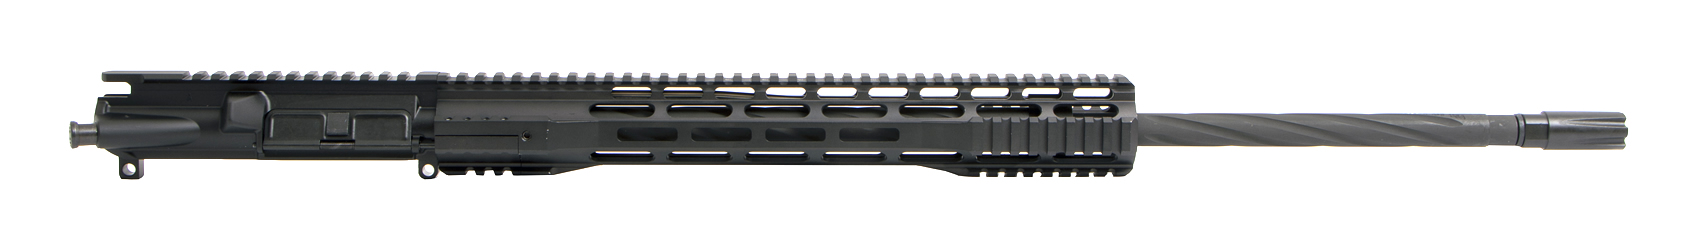 "AR-15 Upper Assembly 24"" Wylde Spiral Fluted"